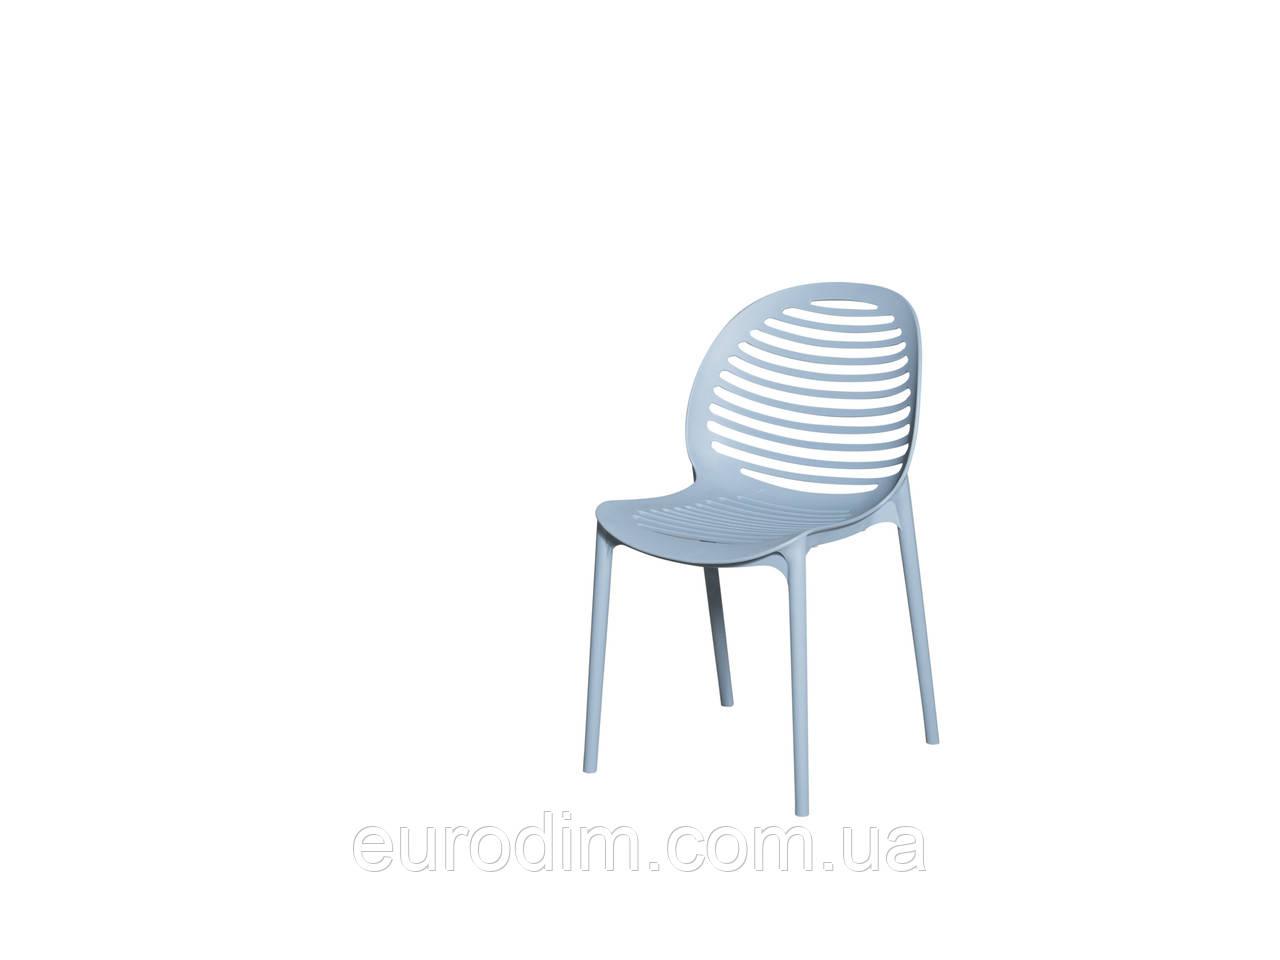 Стул пластиковый SPICE OW-241 blue